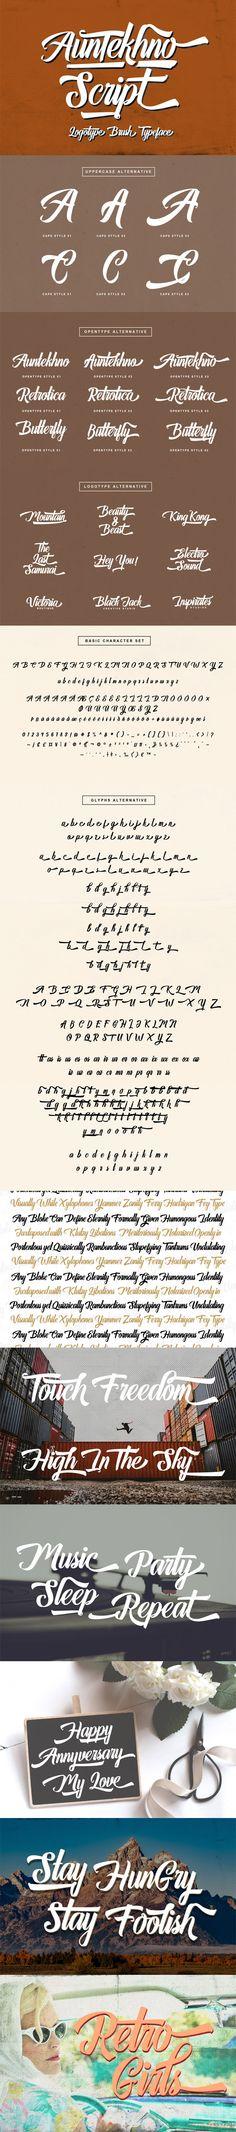 Auntekhno Script - Calligraphy Script